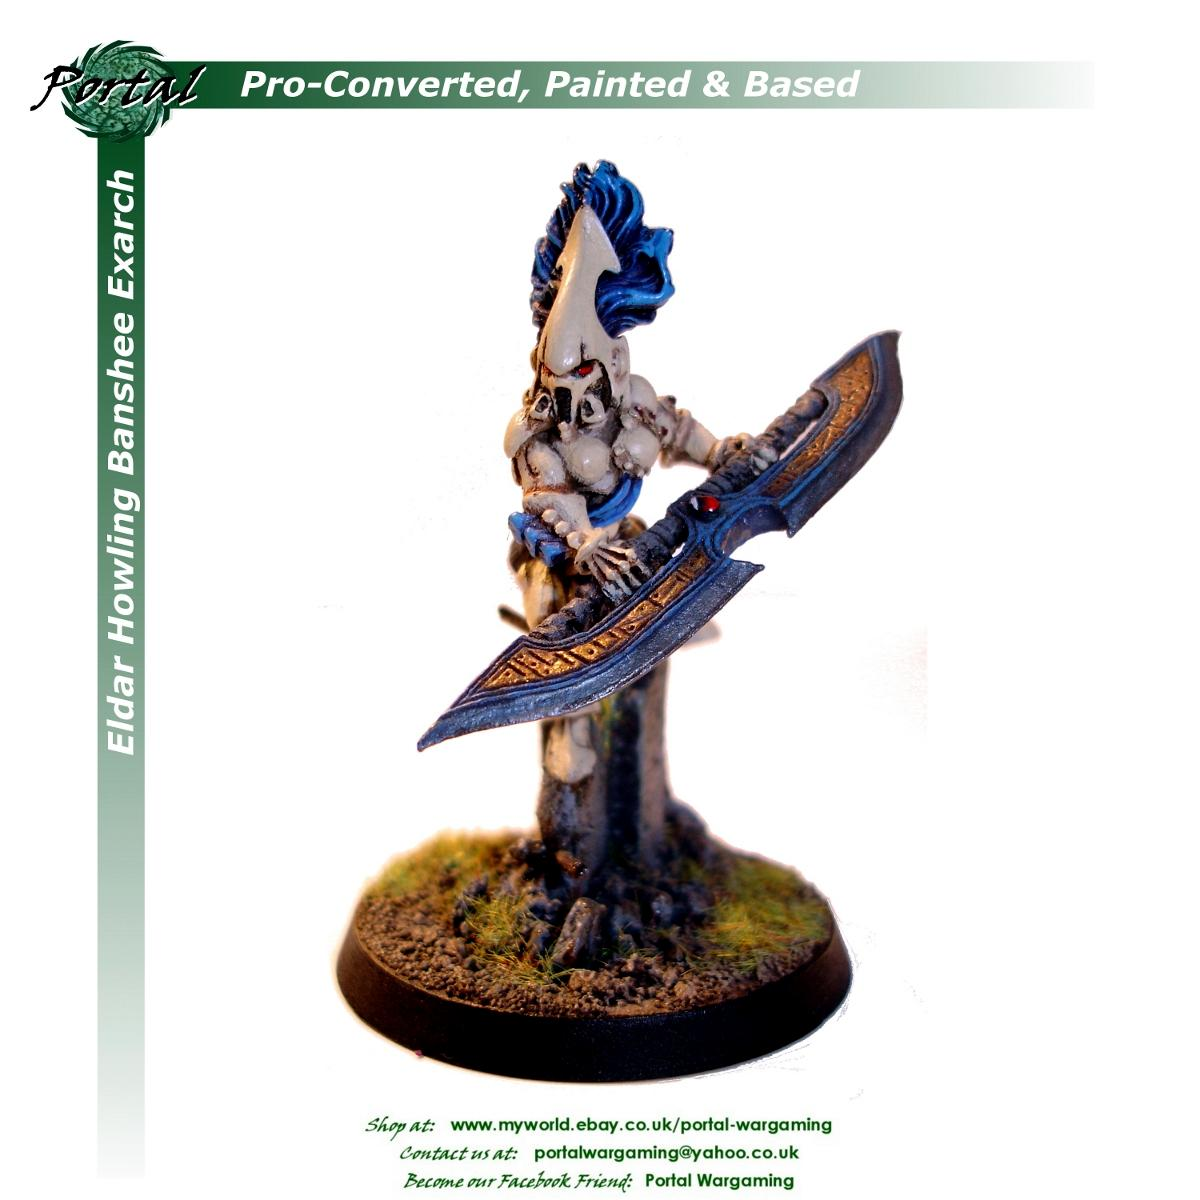 Eldar, Pro-based, Pro-converted, Pro-painted, Warhammer 40,000